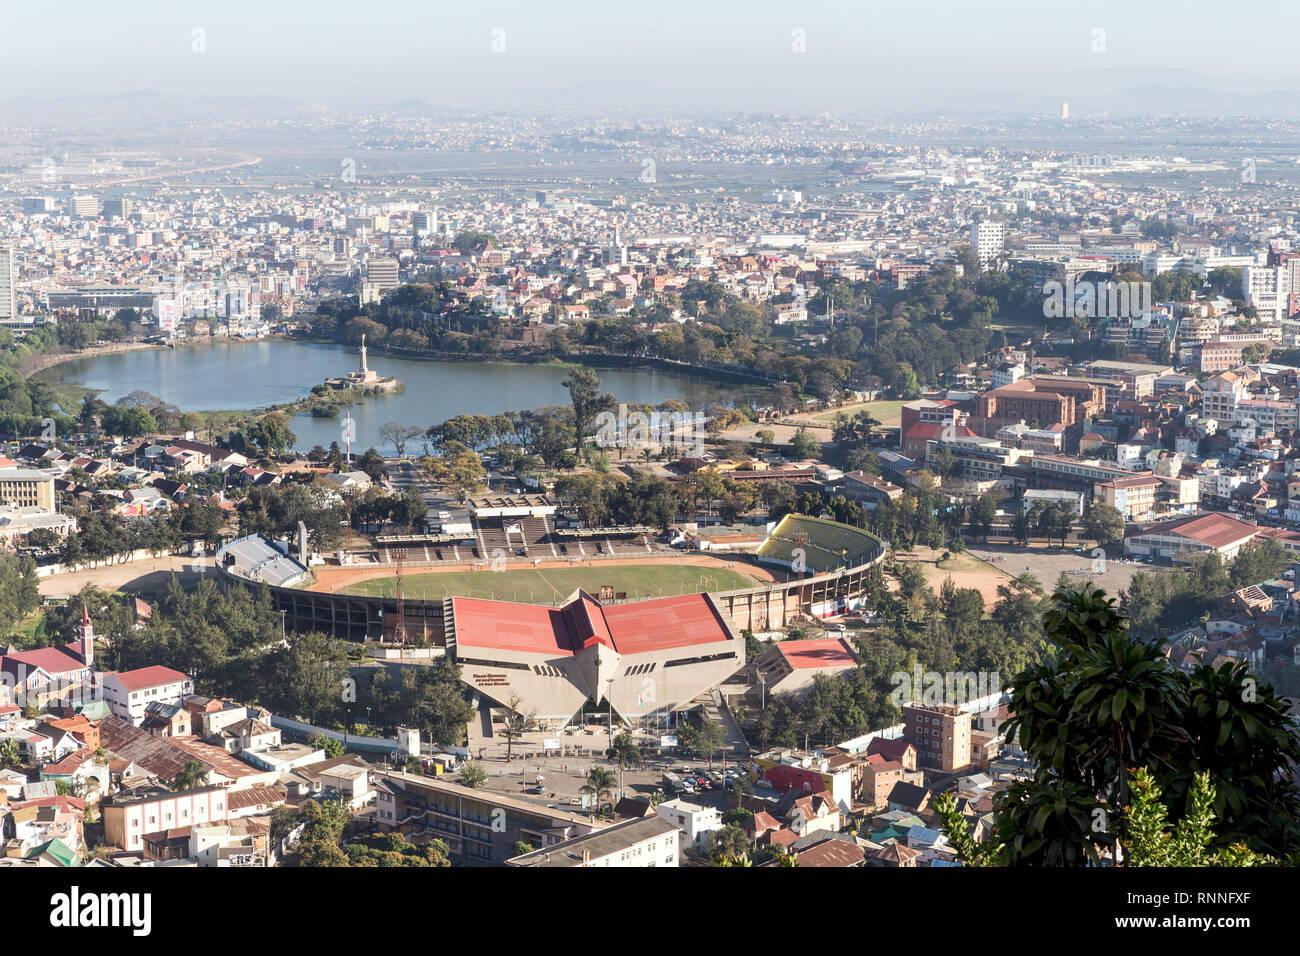 Central lake and stadium, Antananarivo, Madagascar - Stock Image